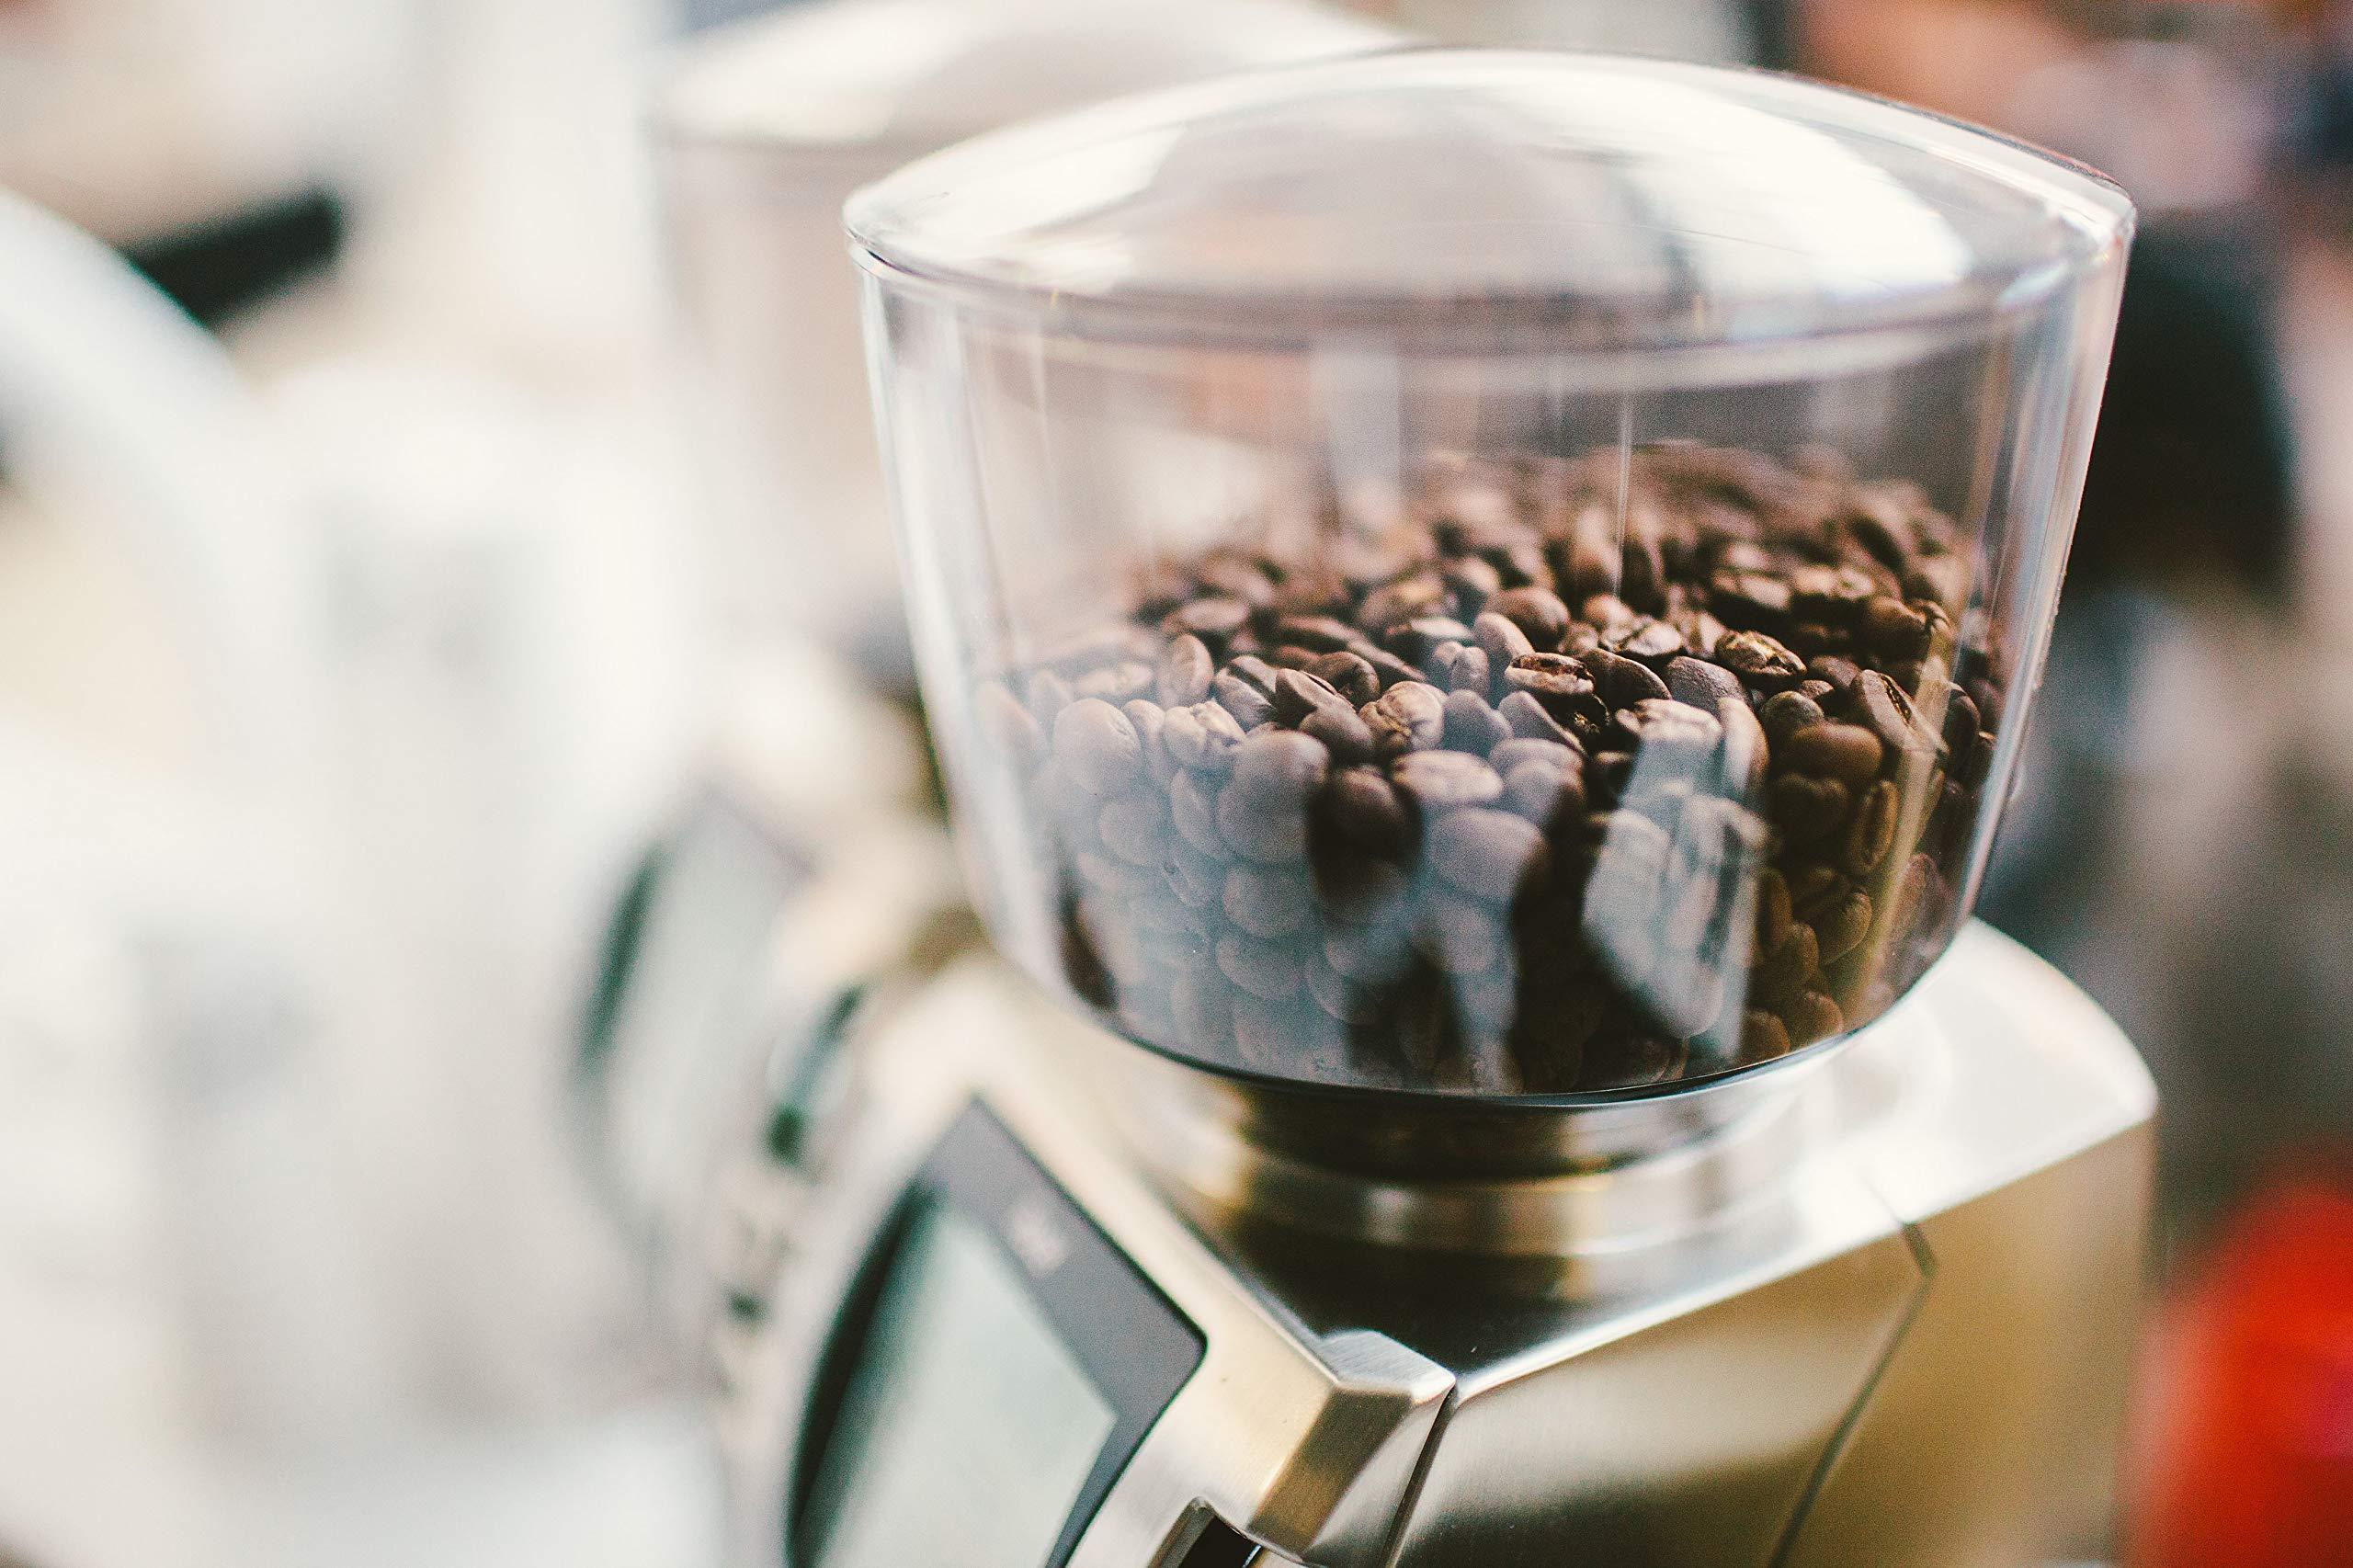 Baratza Forte BG (Brew Grinder) Flat Steel Burr Commercial Coffee Grinder